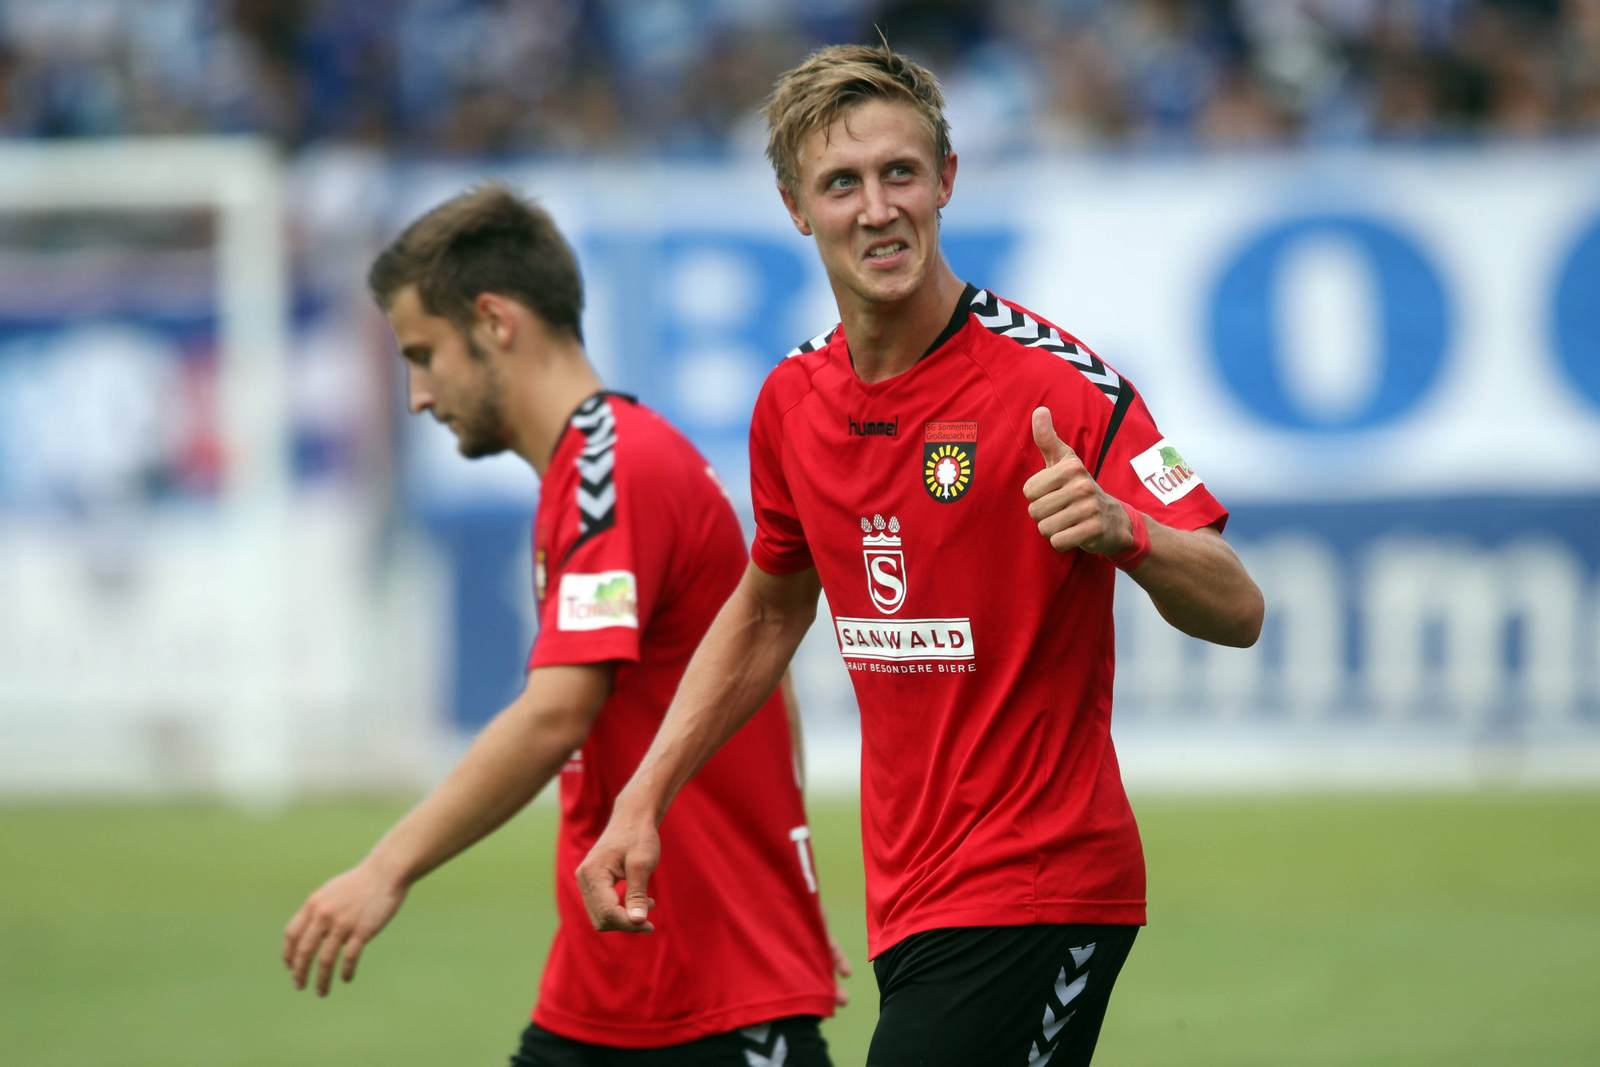 Sebastian Schiek nach seinem Treffer zum 1:0 gegen den 1. FC Magdeburg